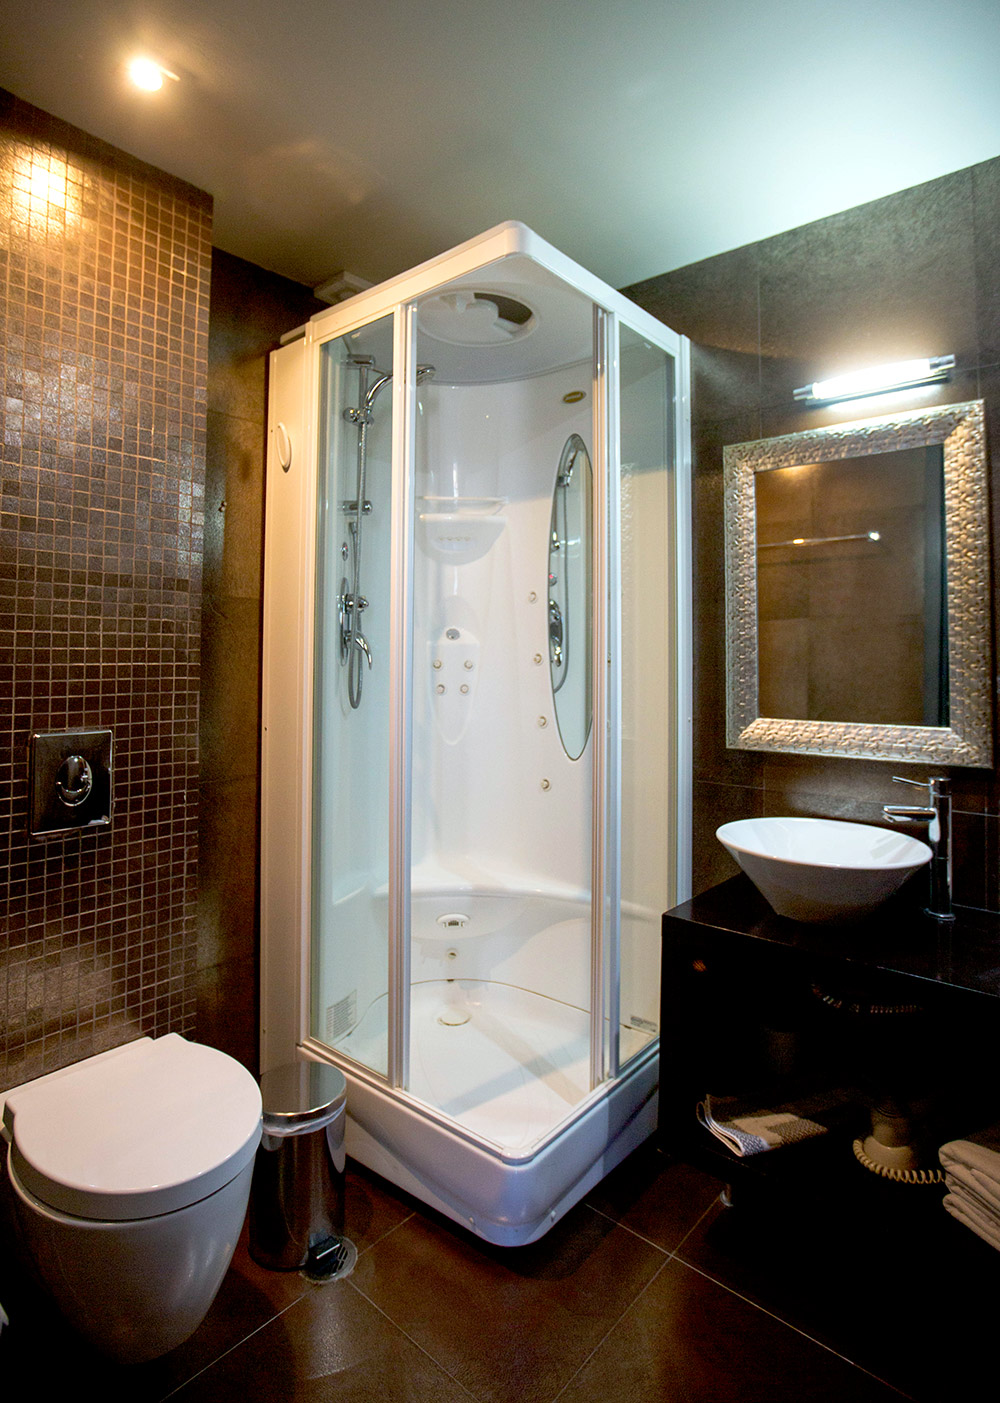 aion-hotel-nafplio-bathroom2-2.jpg